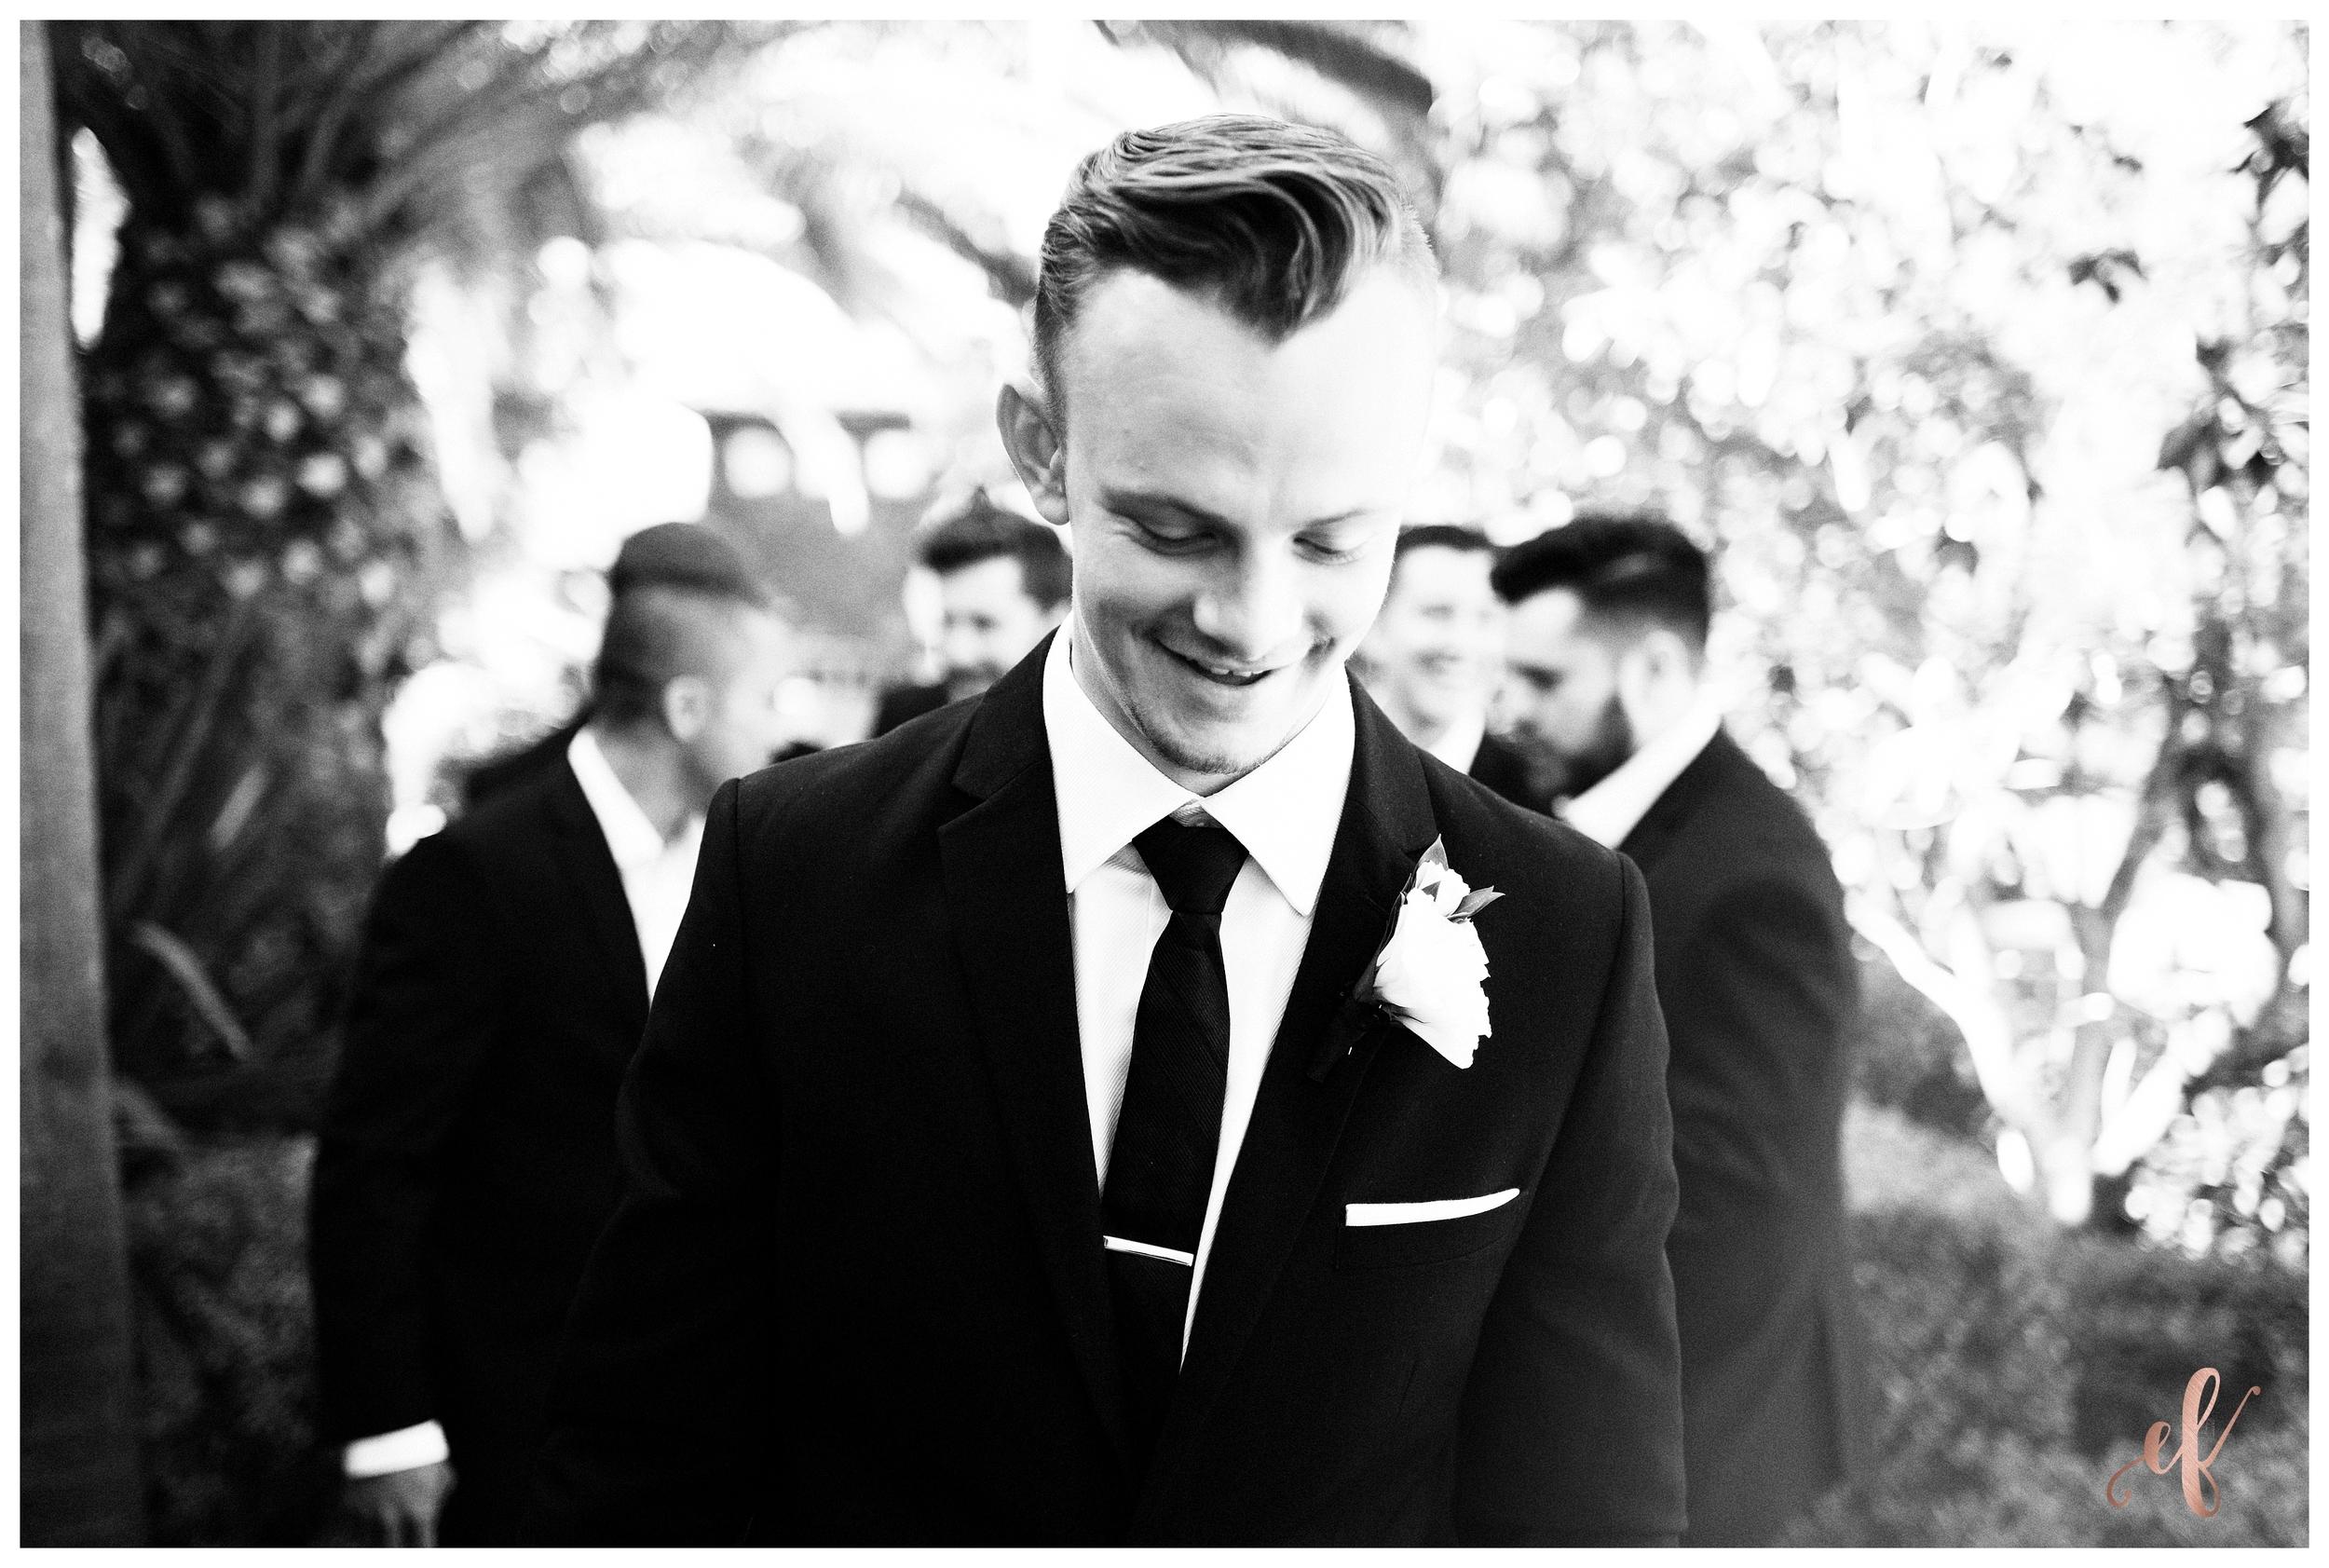 San Diego Wedding Photographer   Ernie & Fiona Photography   Groom   Groomsmen